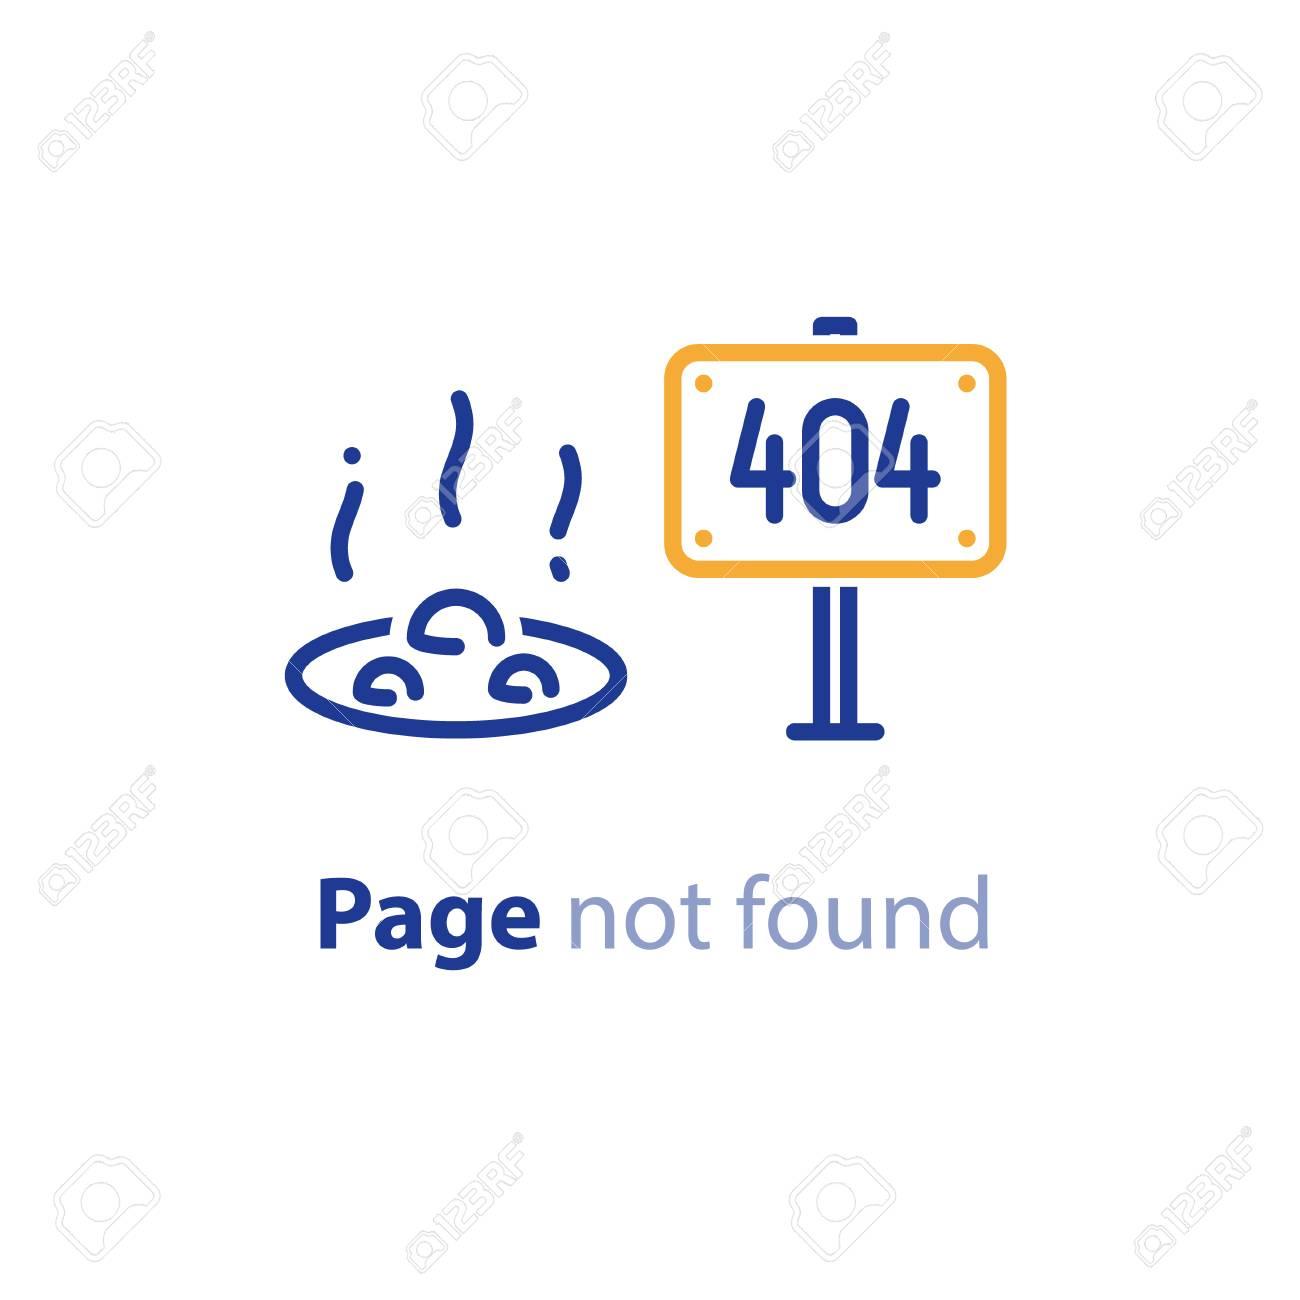 Error 404 page not found concept illustration, webpage banner,